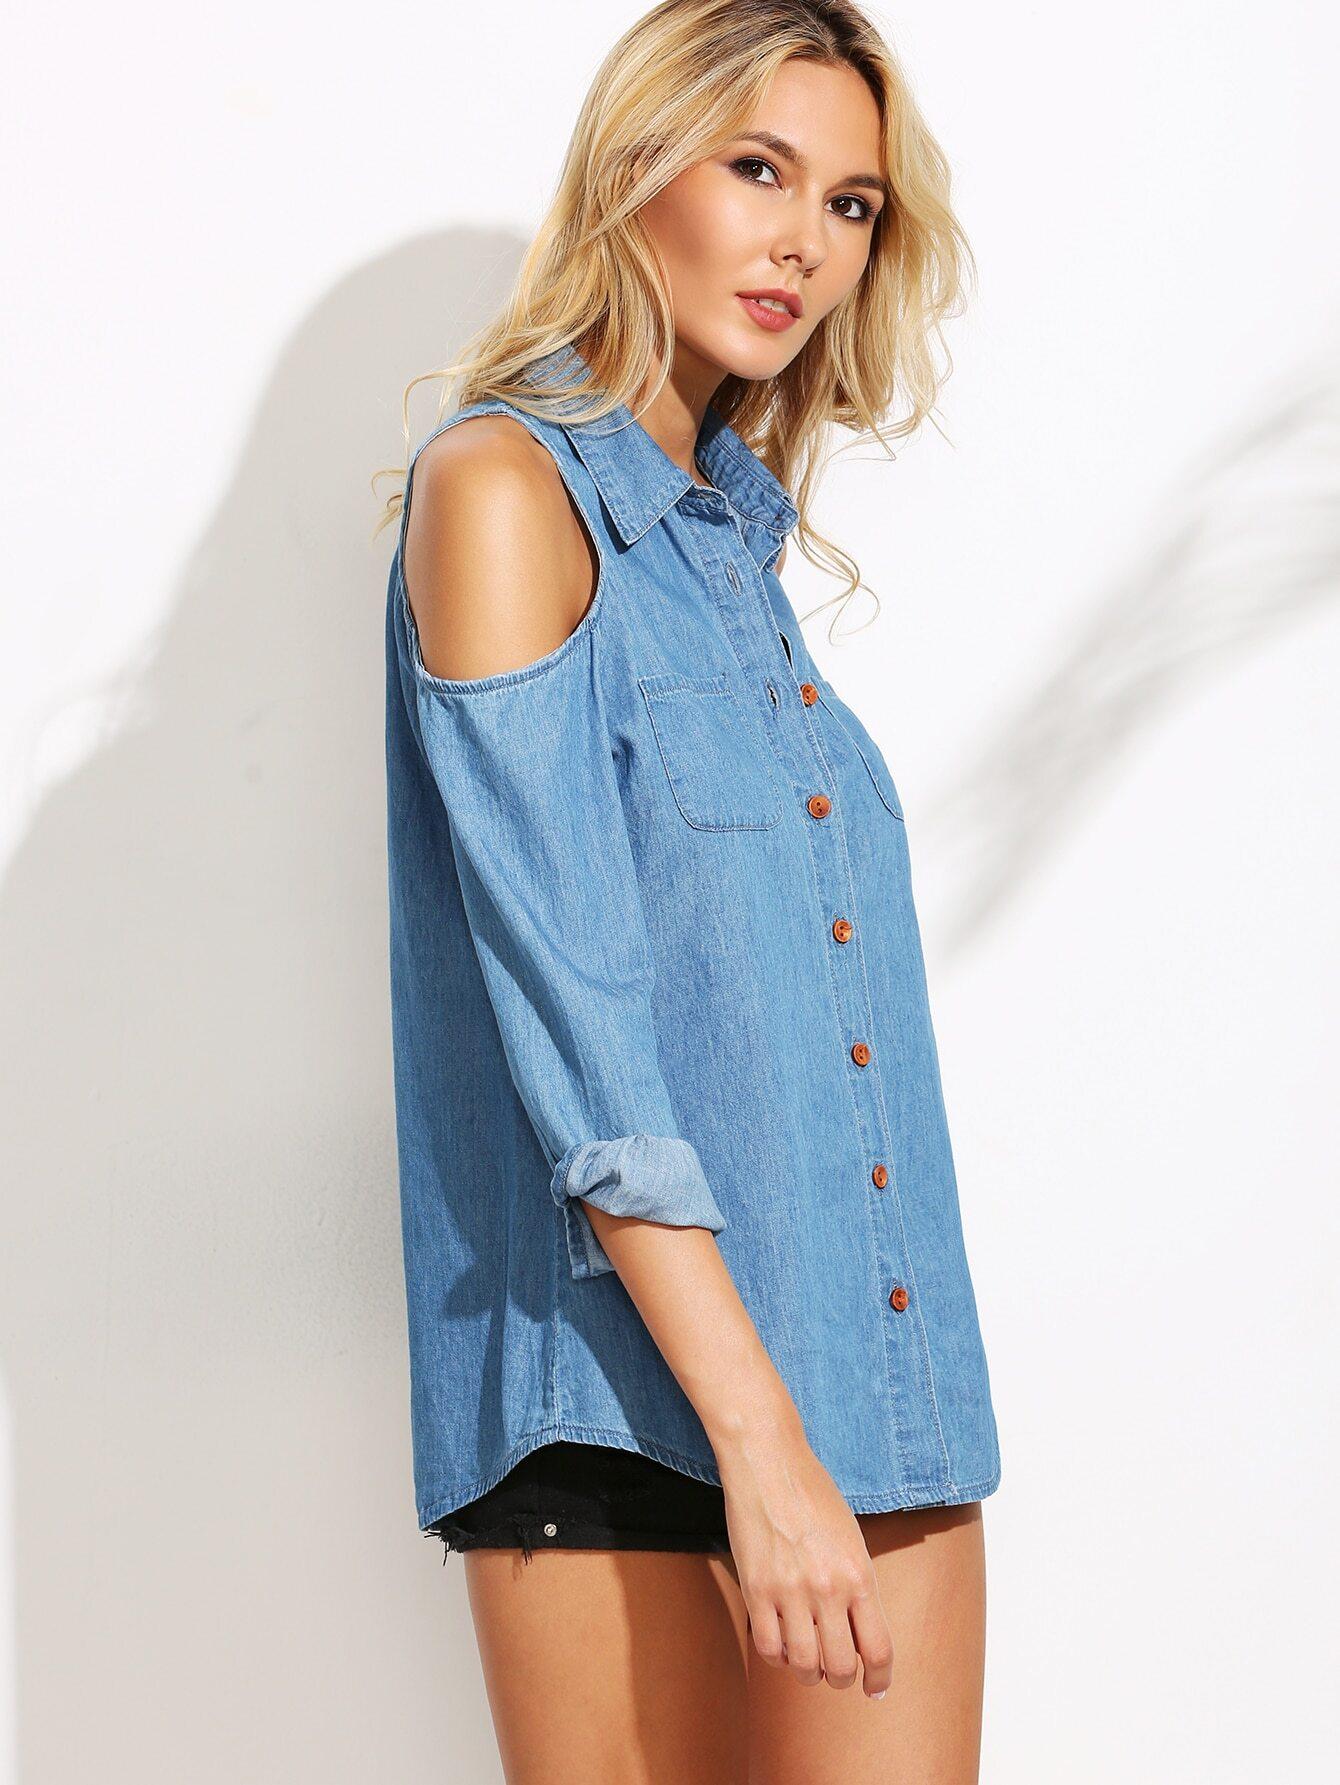 blouse160830402_2